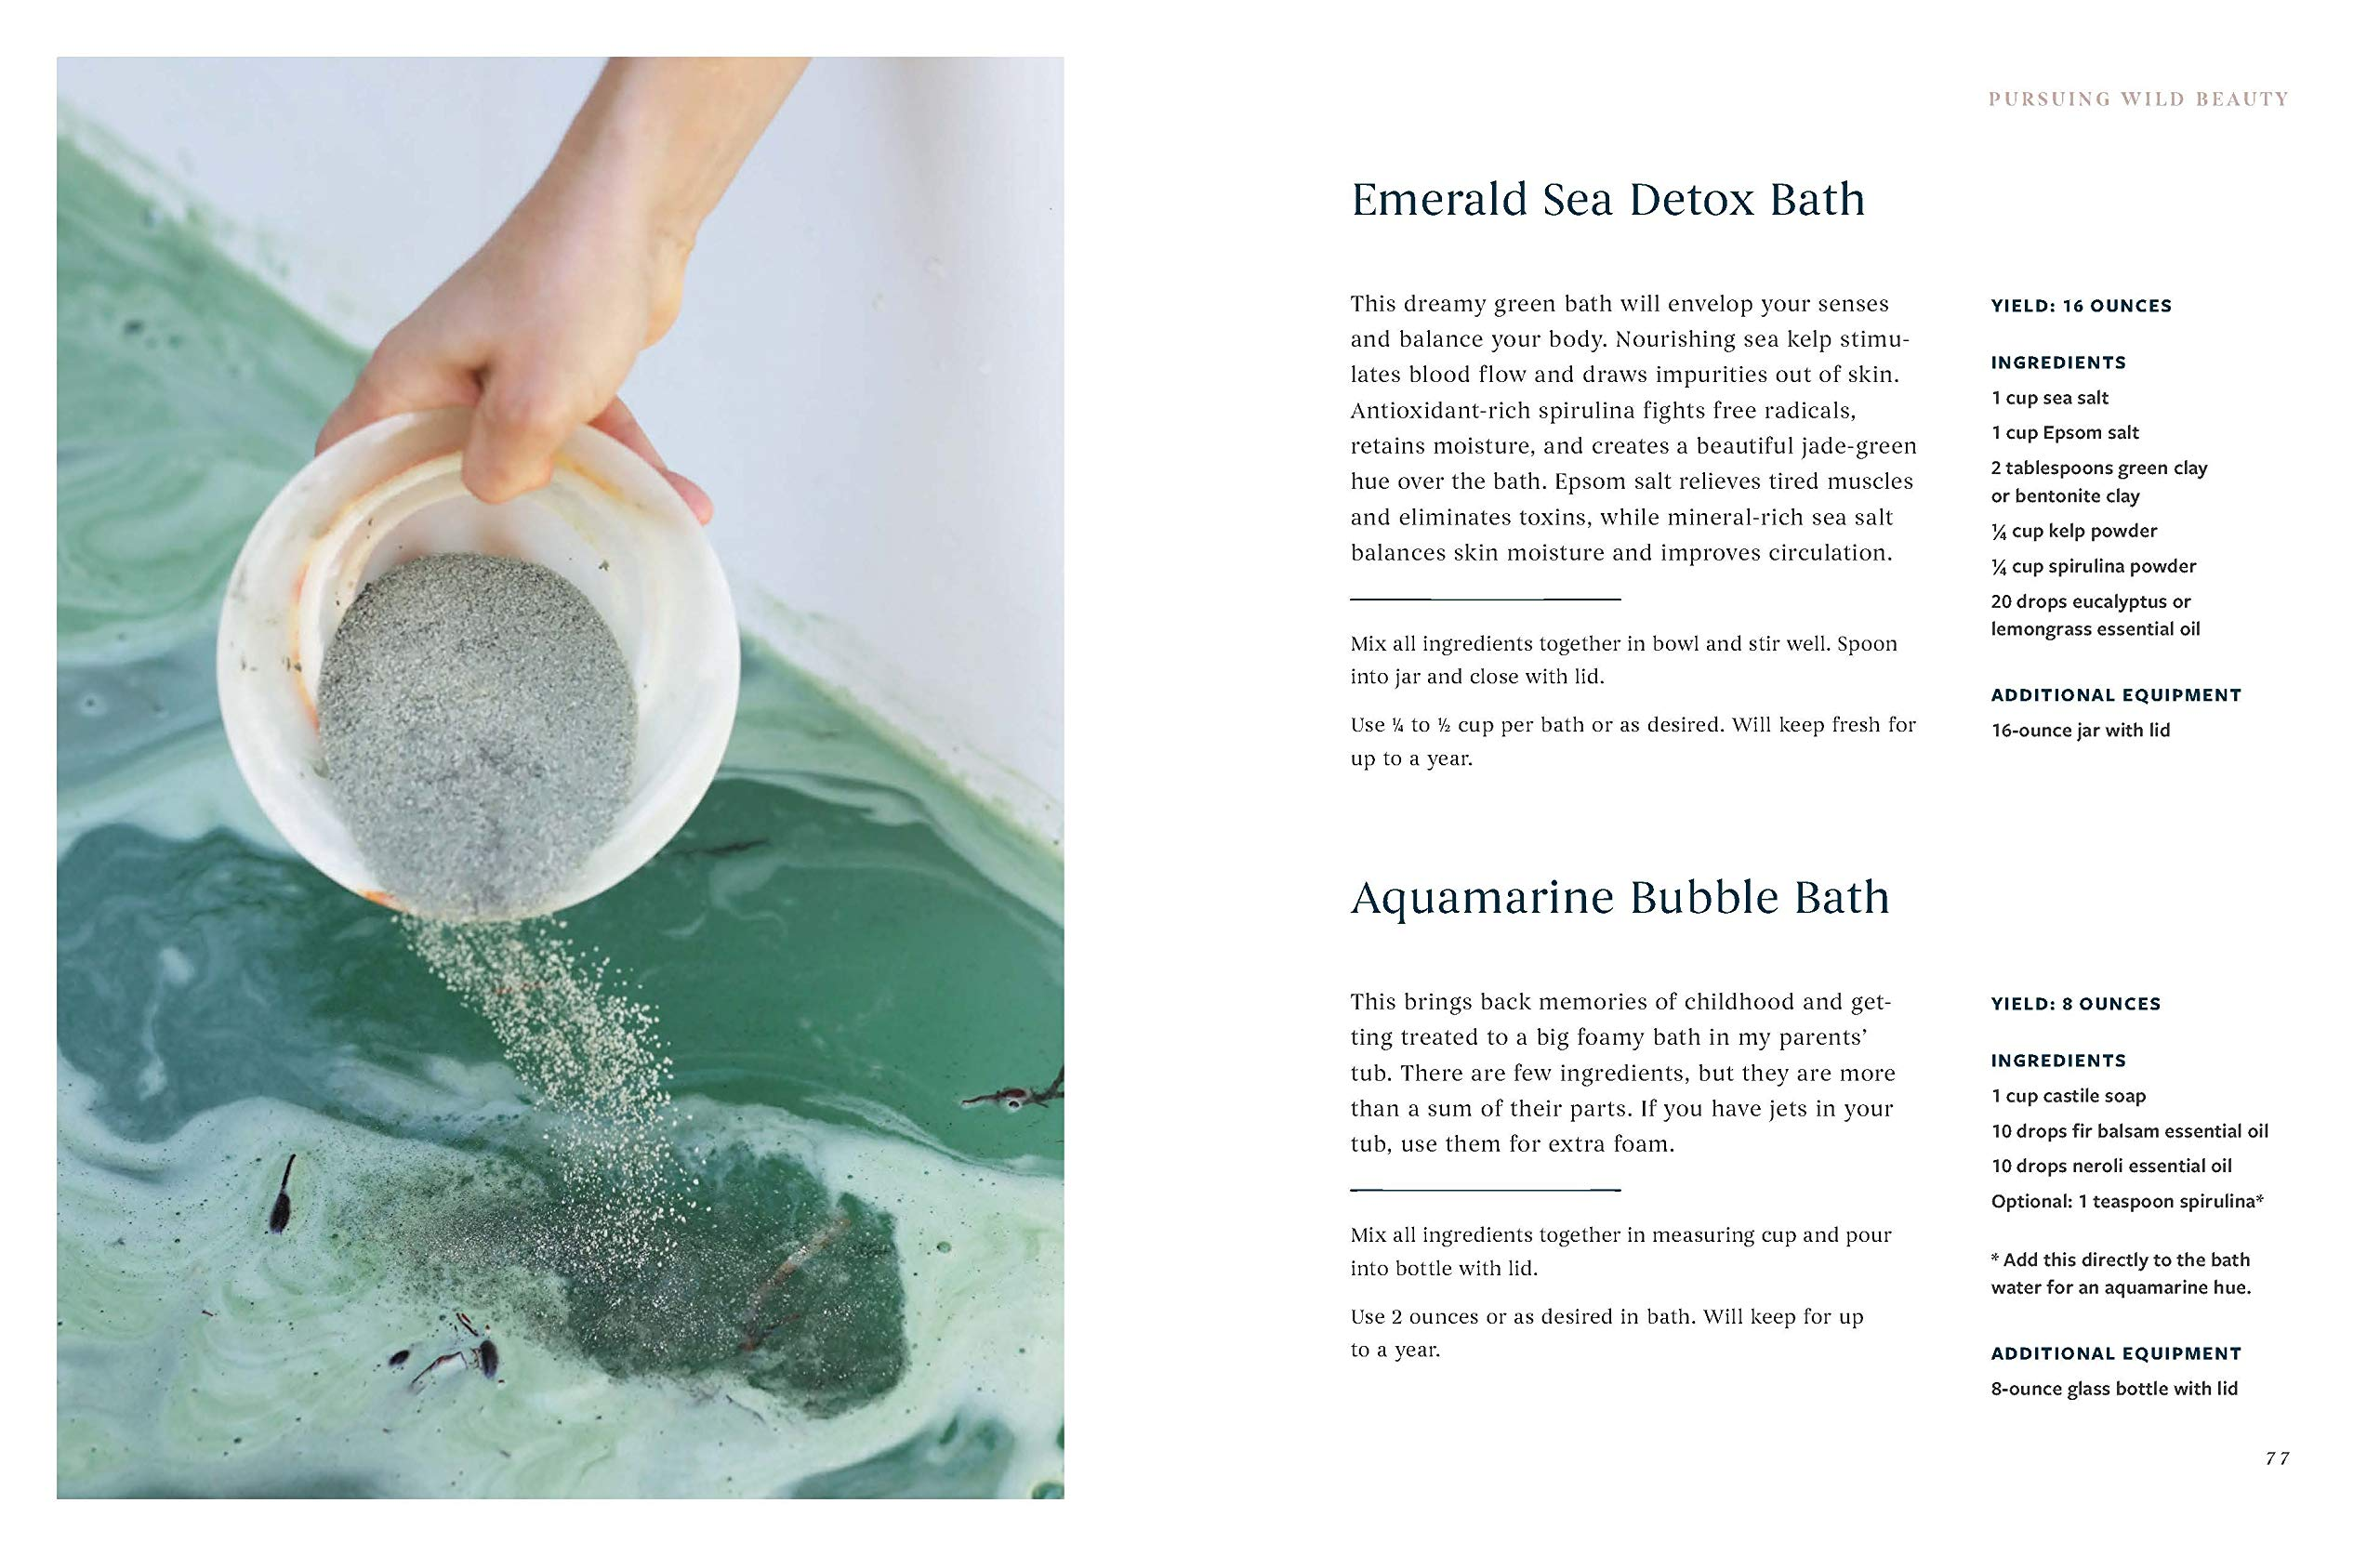 Wild Beauty detox bath